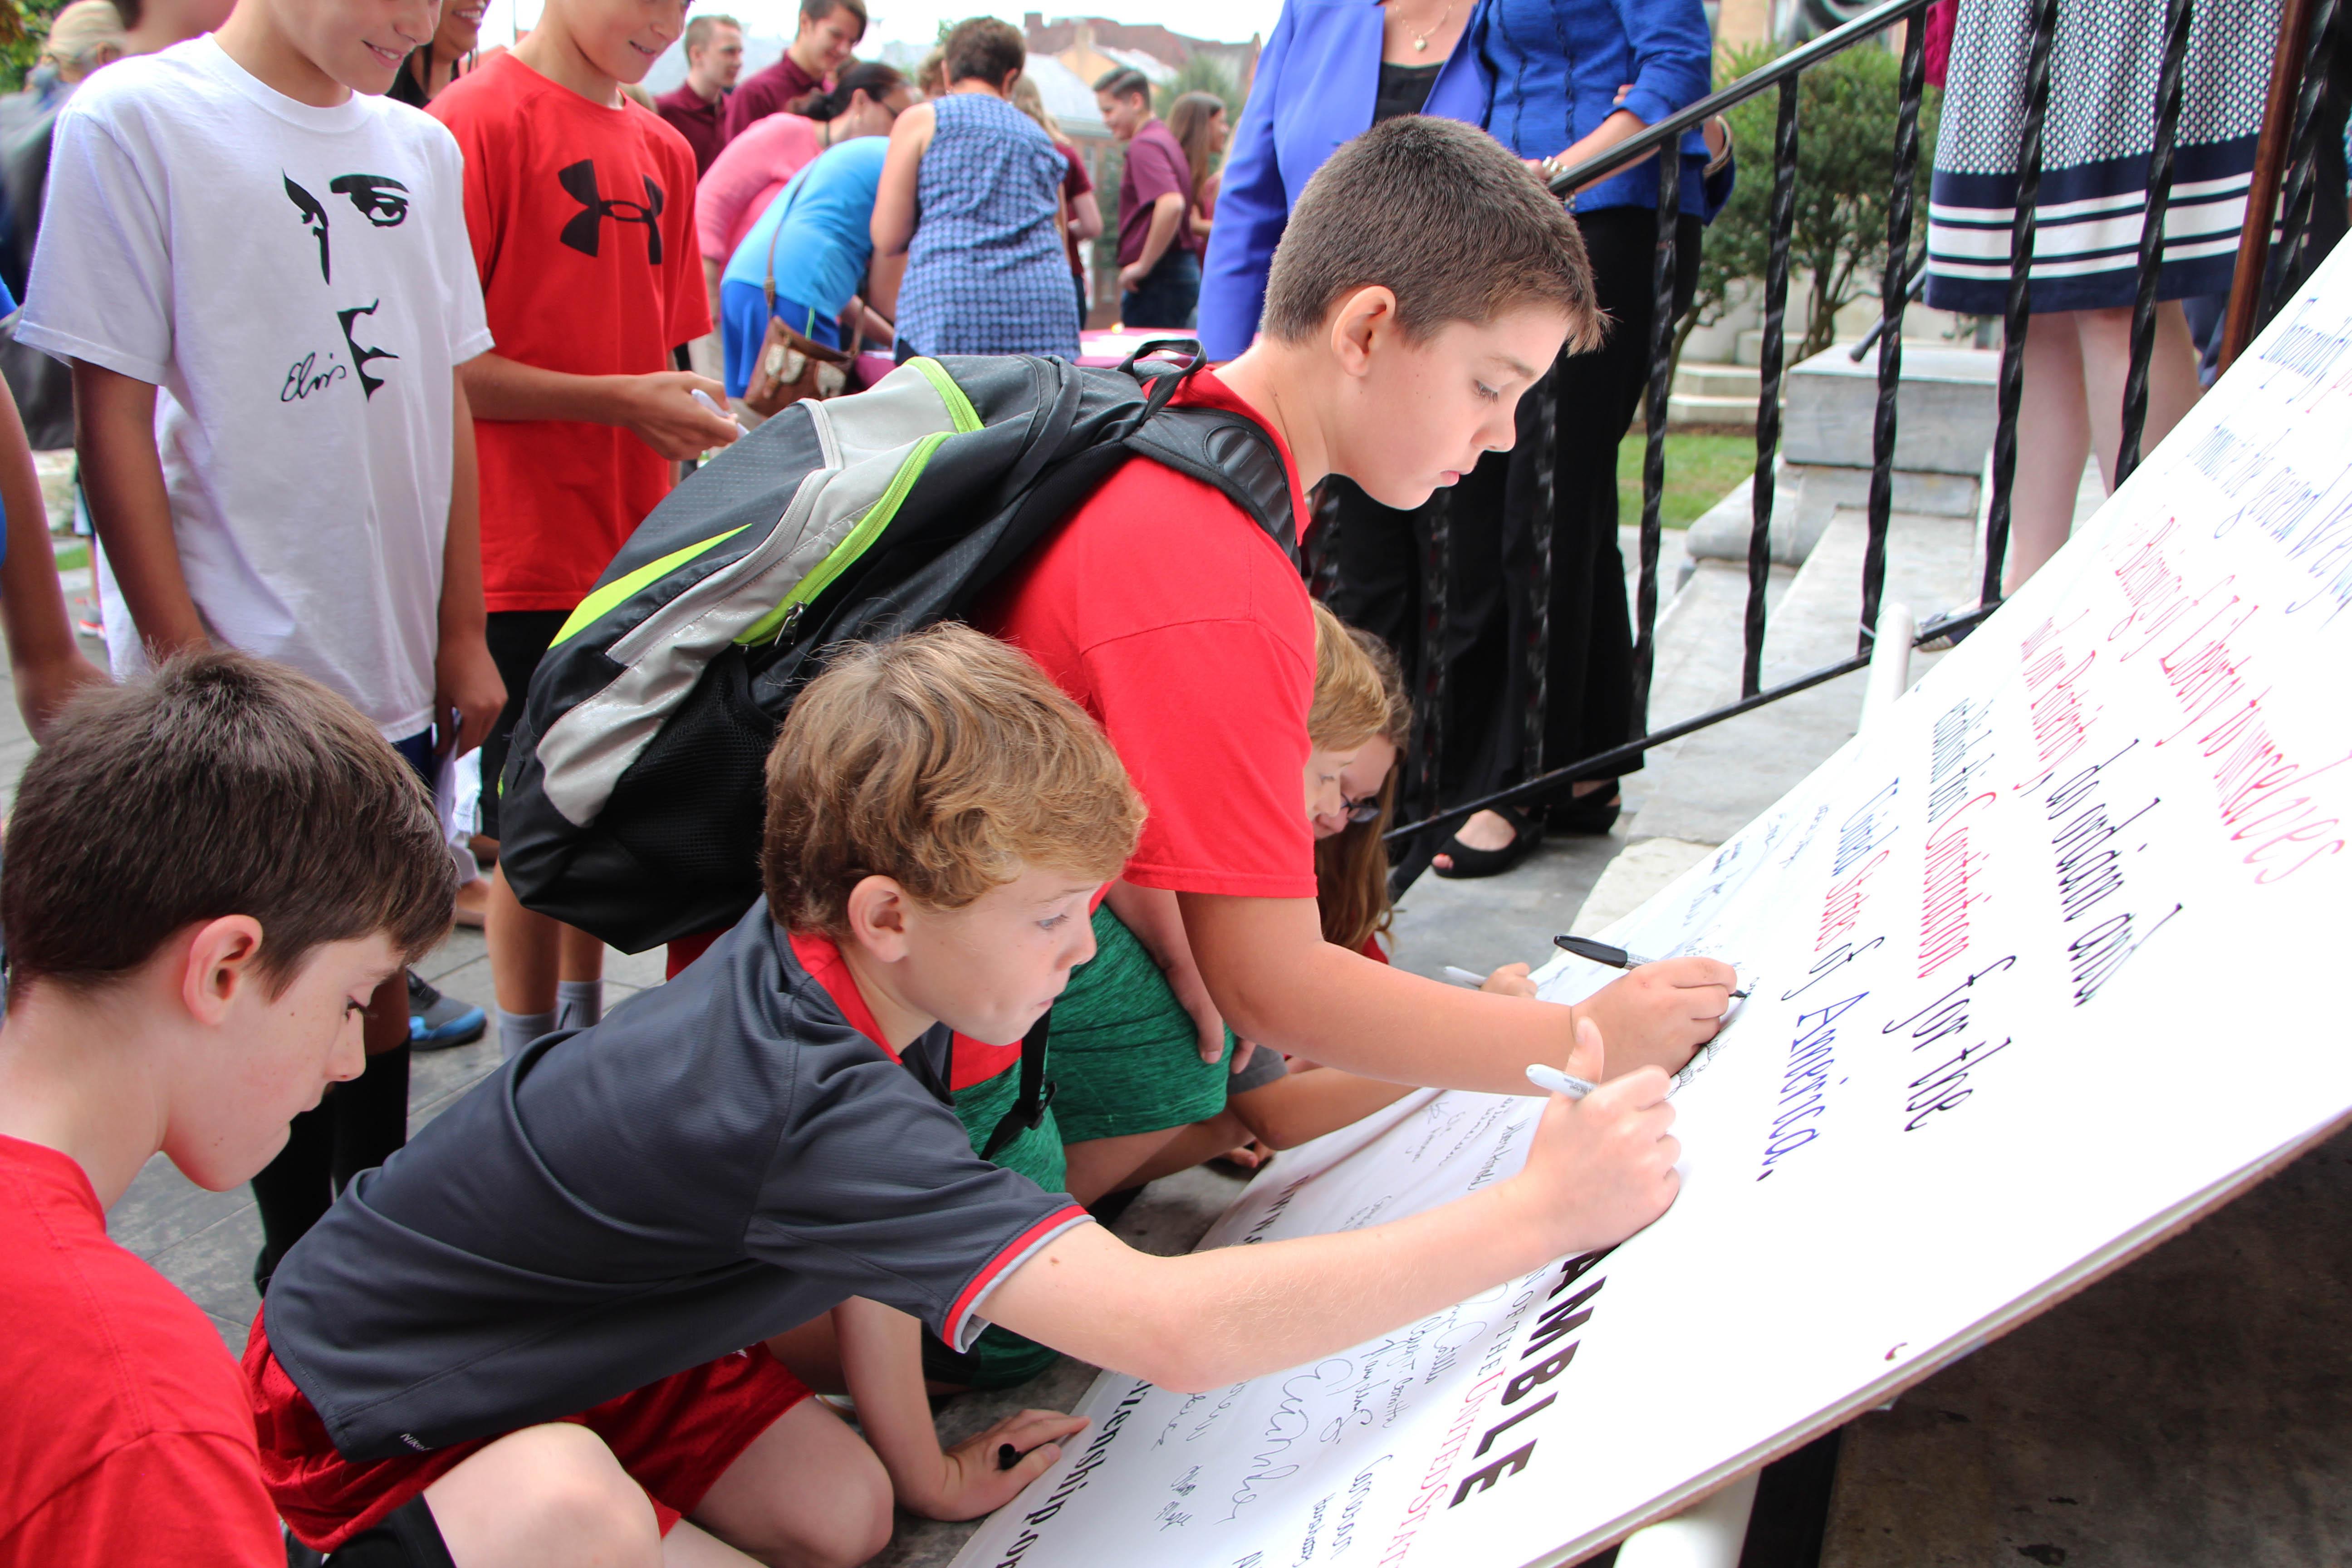 Students, Legislators Celebrate Chester County Constitution Day